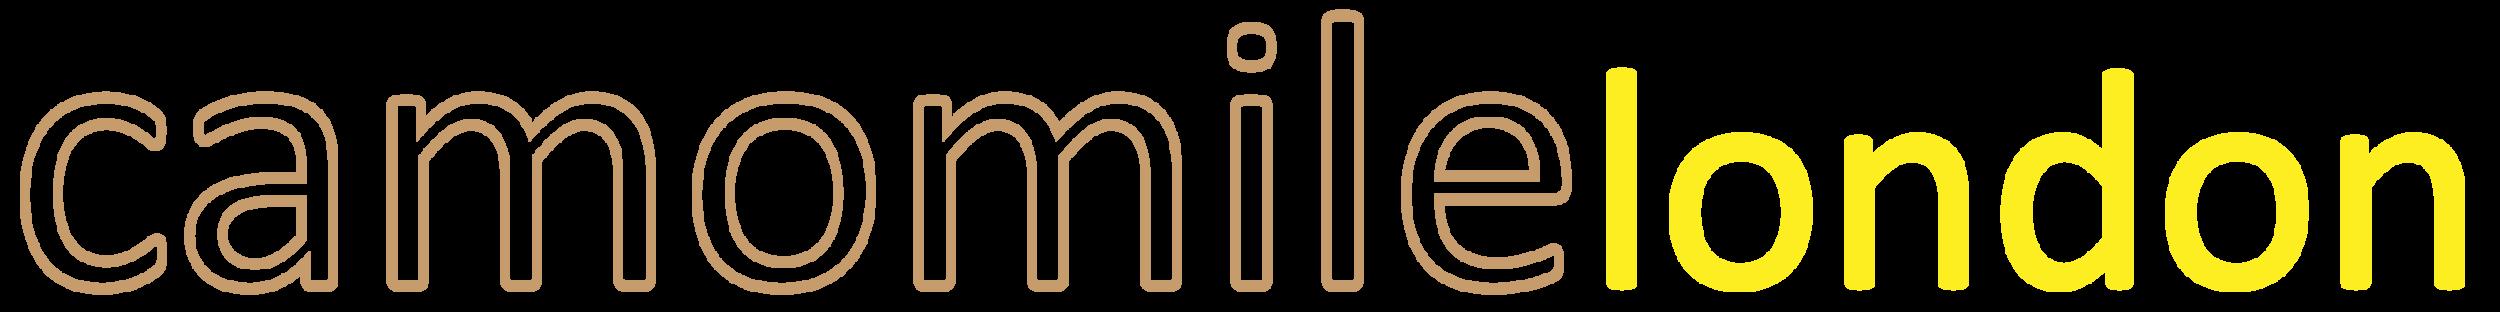 camomile london logo colour.png